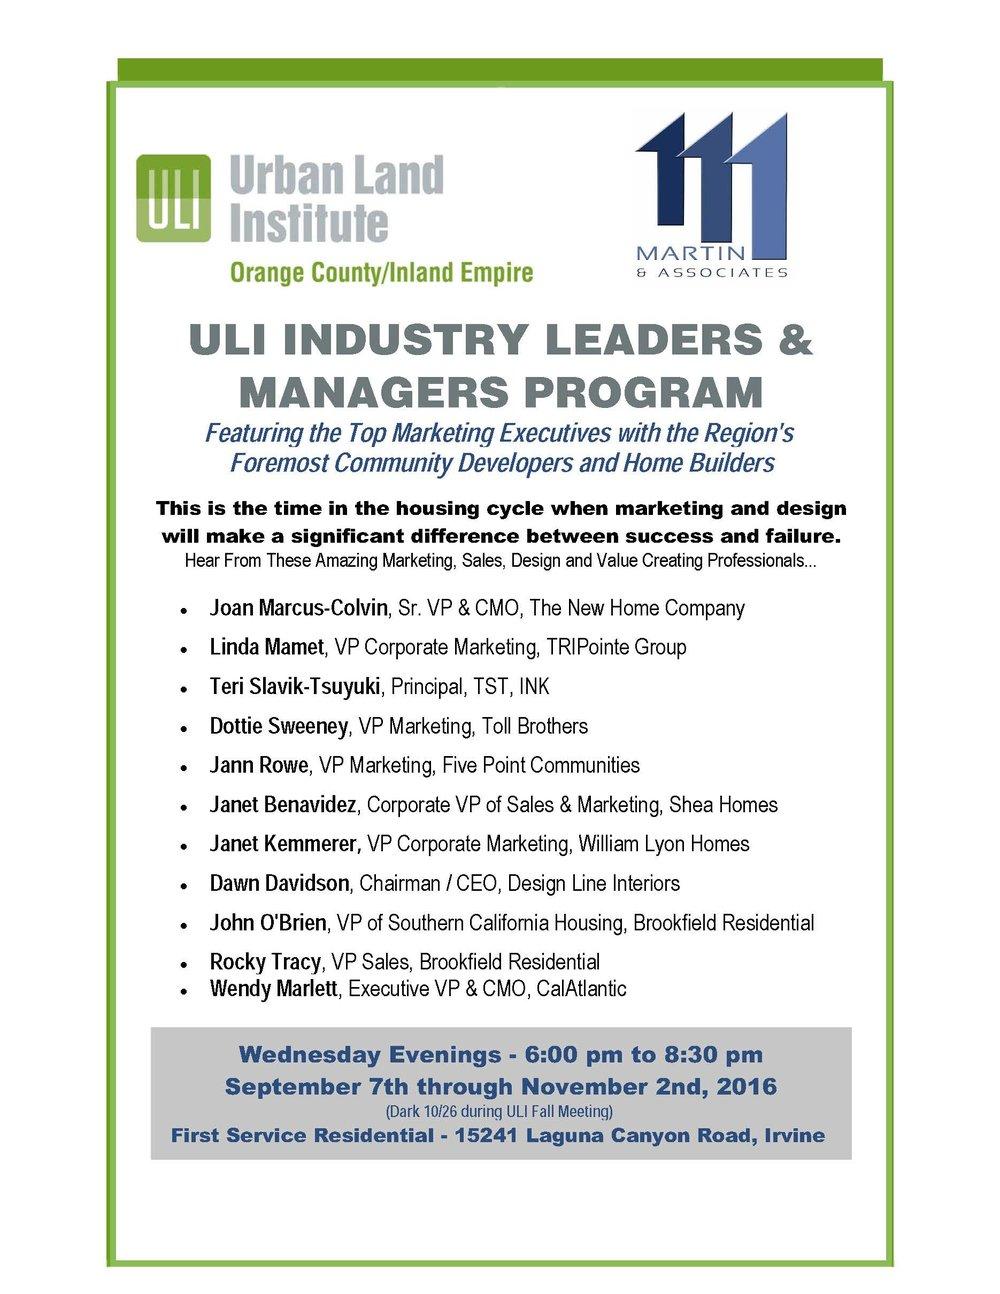 ULI INDUSTRY PROGRAM SEPT2016 p1.JPG